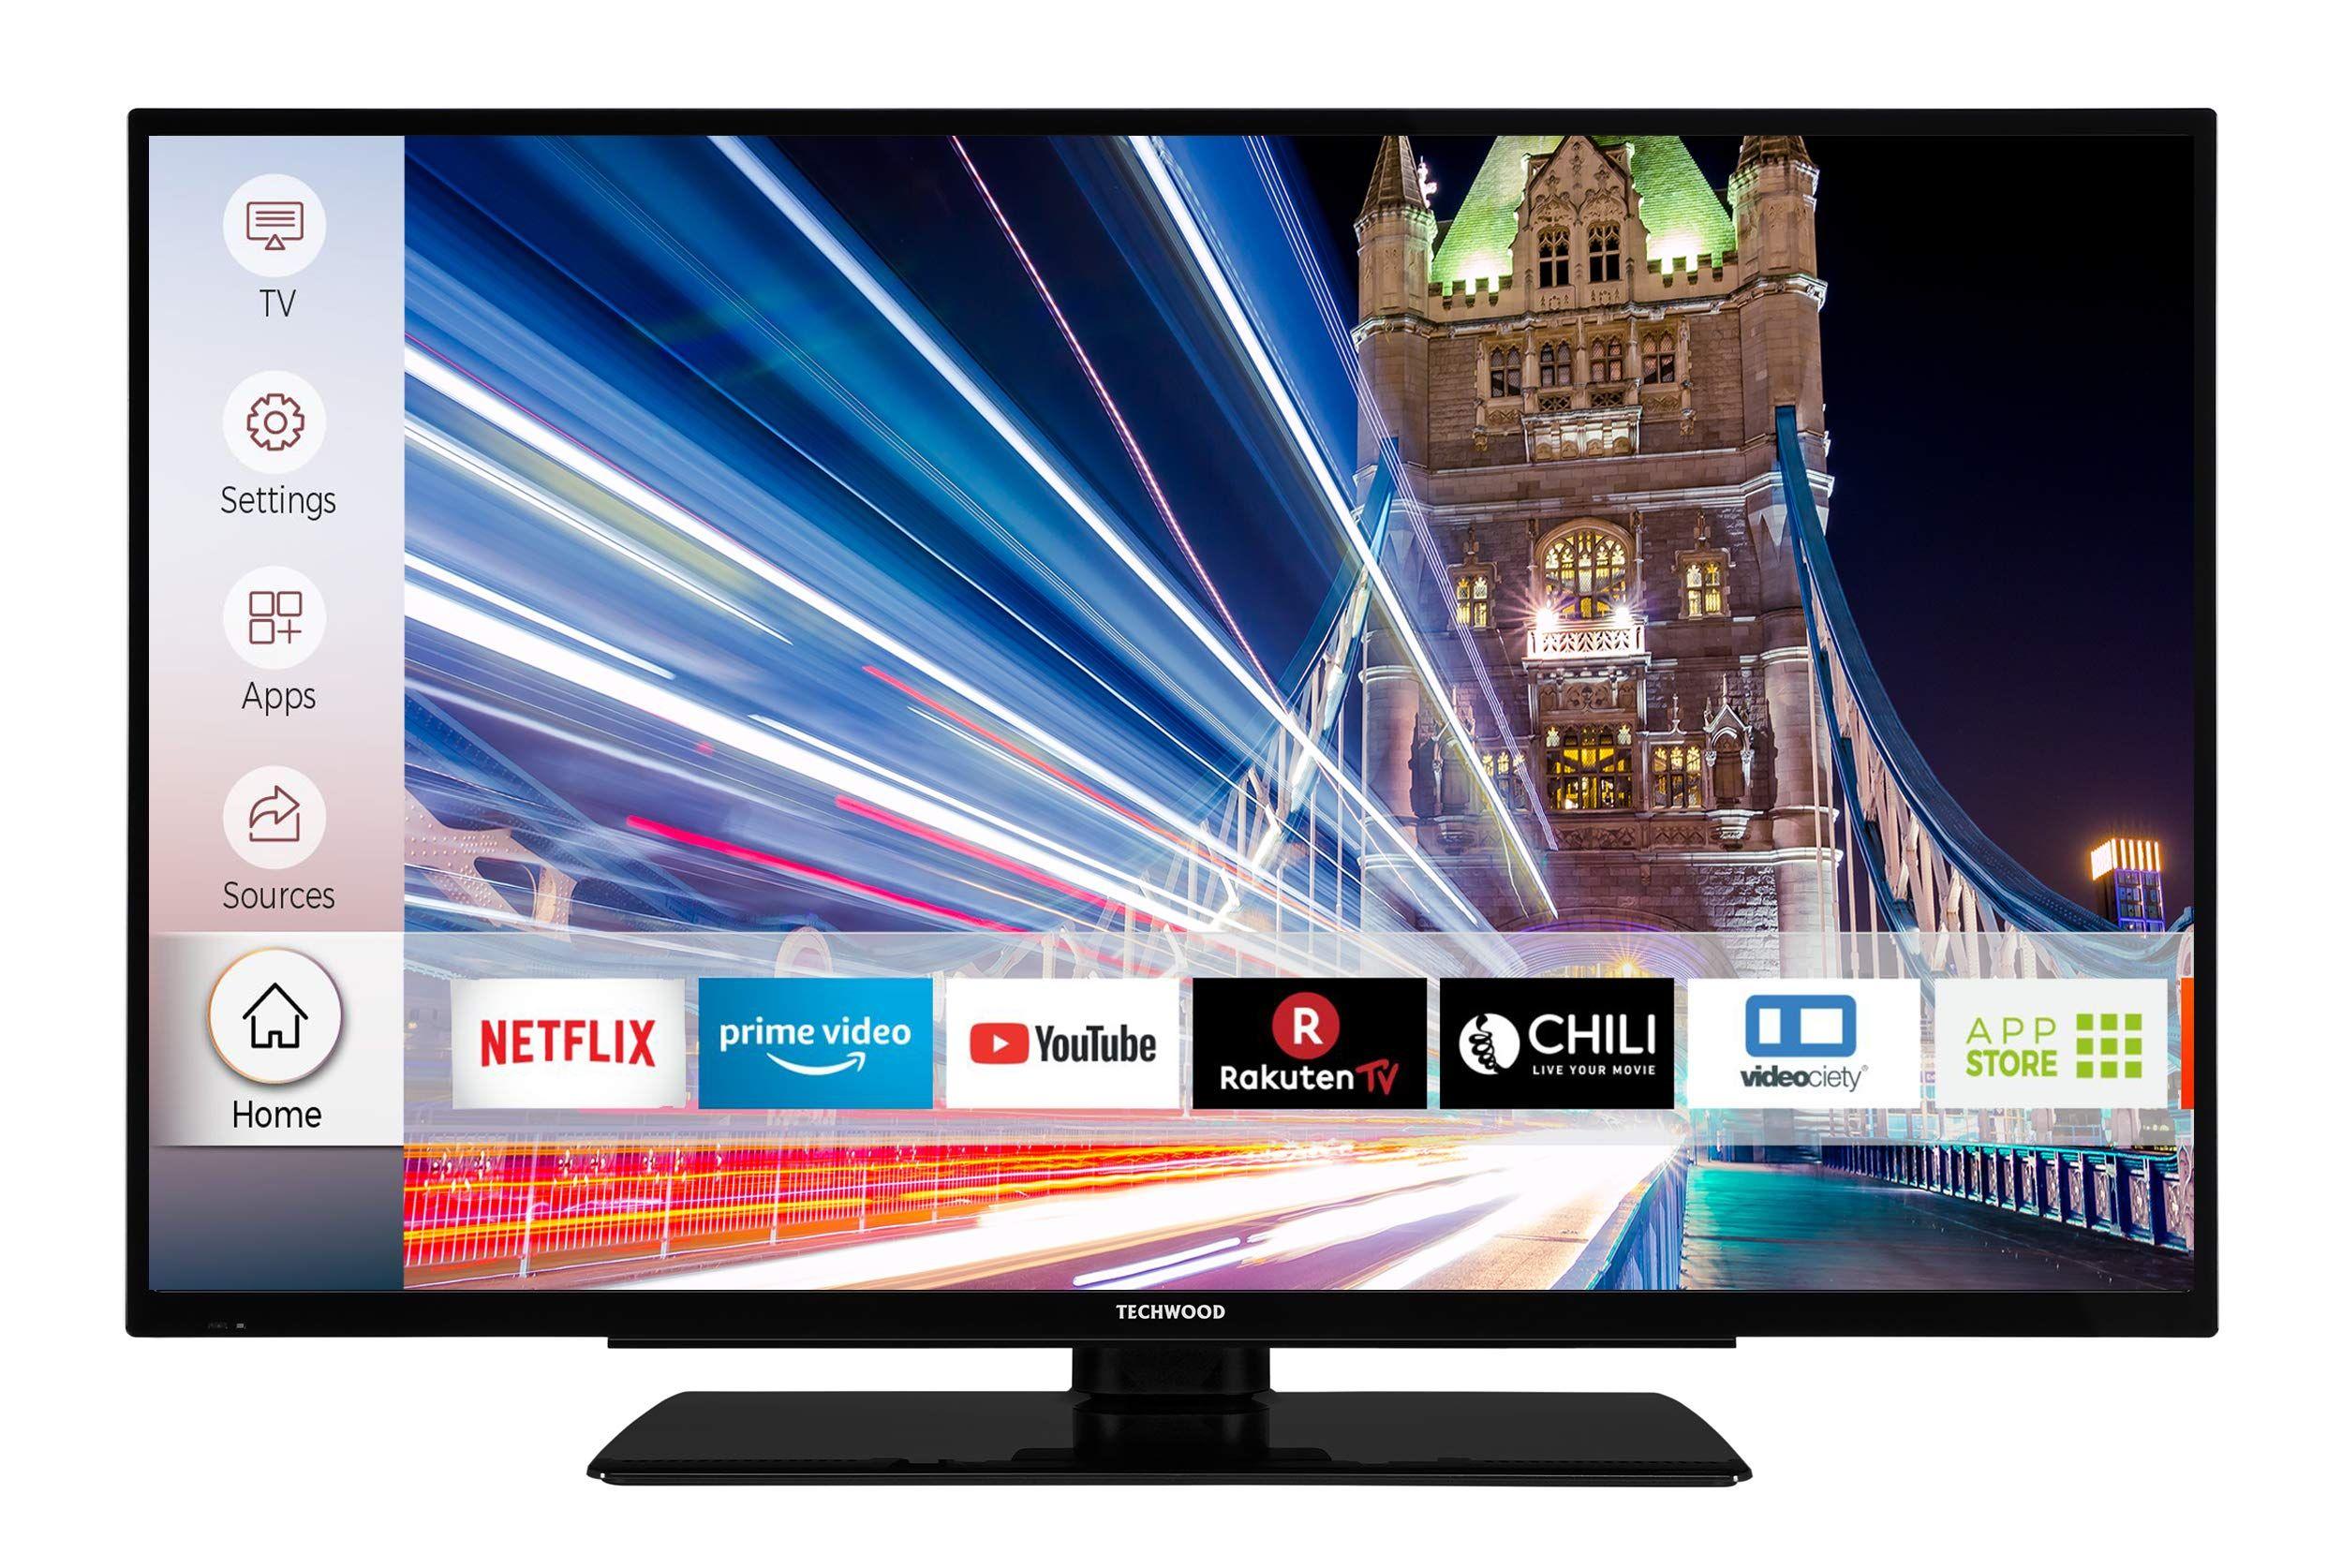 Techwood U40t52c 102 Cm 40 Zoll Fernseher 4k Ultra Hd Hdr10 Triple Tuner Smart Tv Prime Video Works With Alexa Dolby A In 2020 Smart Tv Works With Alexa Tuner